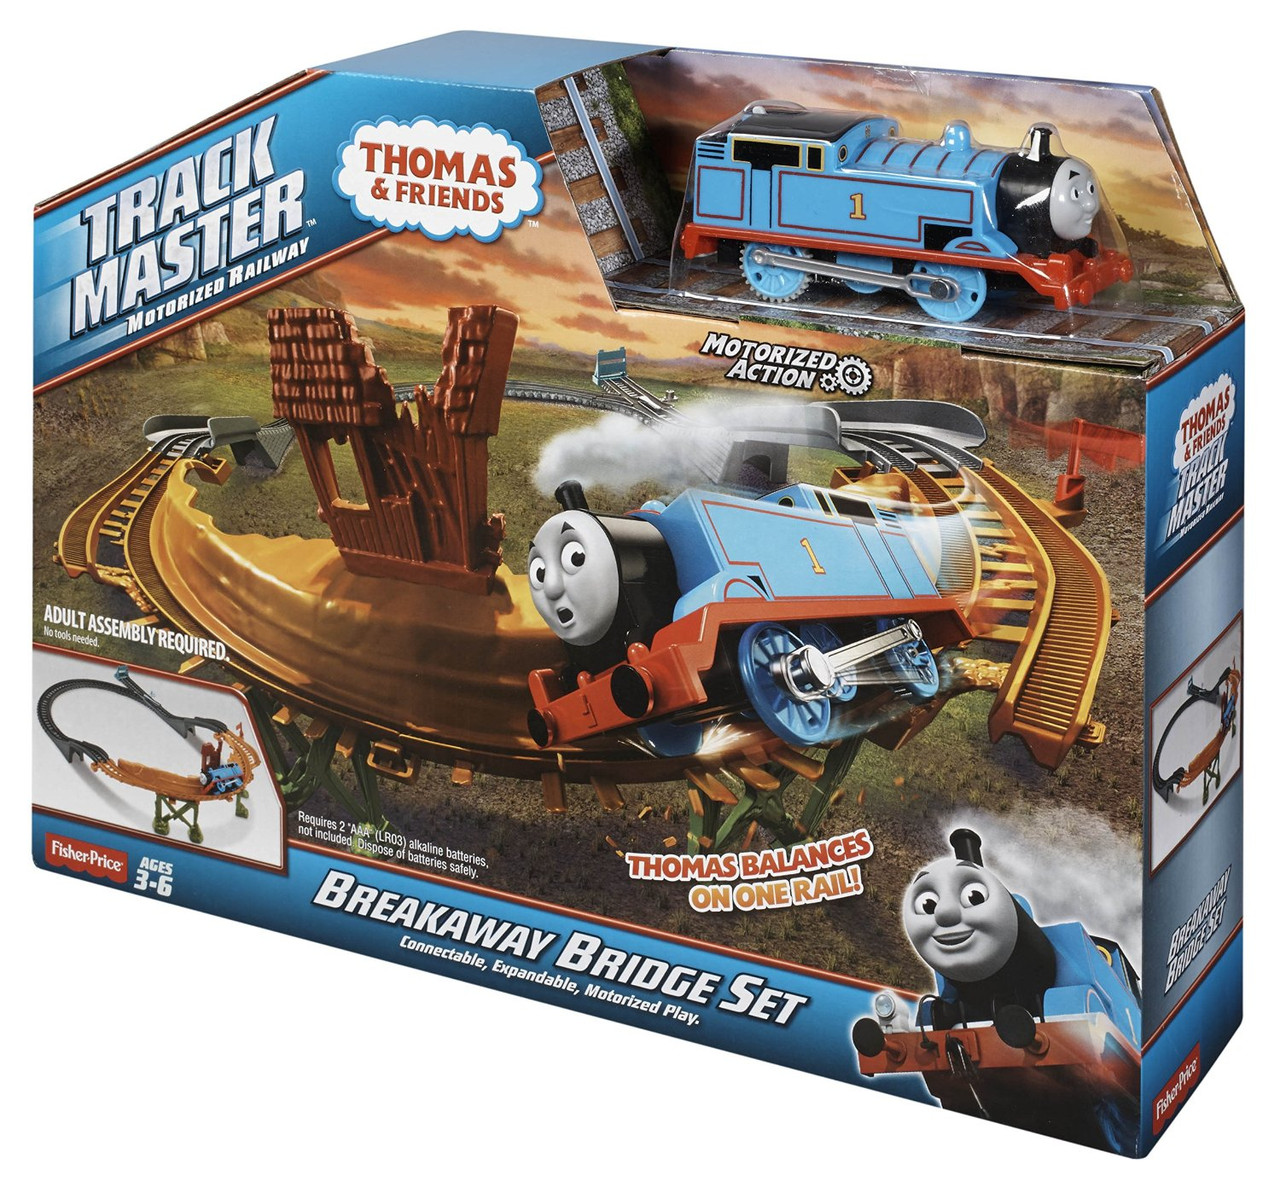 Железная дорога Томас и друзья  серия TrackMaster Thomas The Train  Breakaway Bridge Set